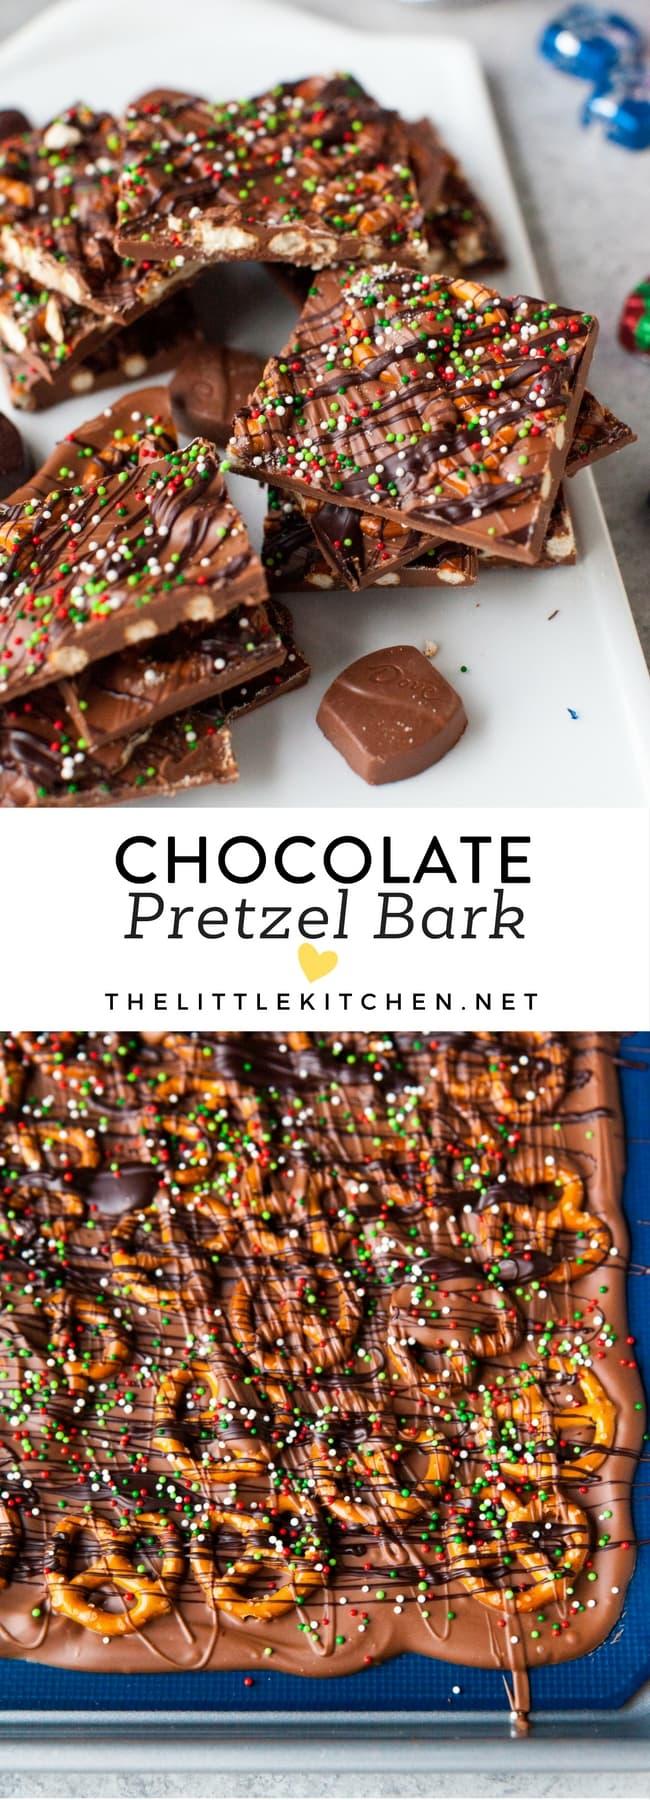 Chocolate Pretzel Bark from thelittlekitchen.net